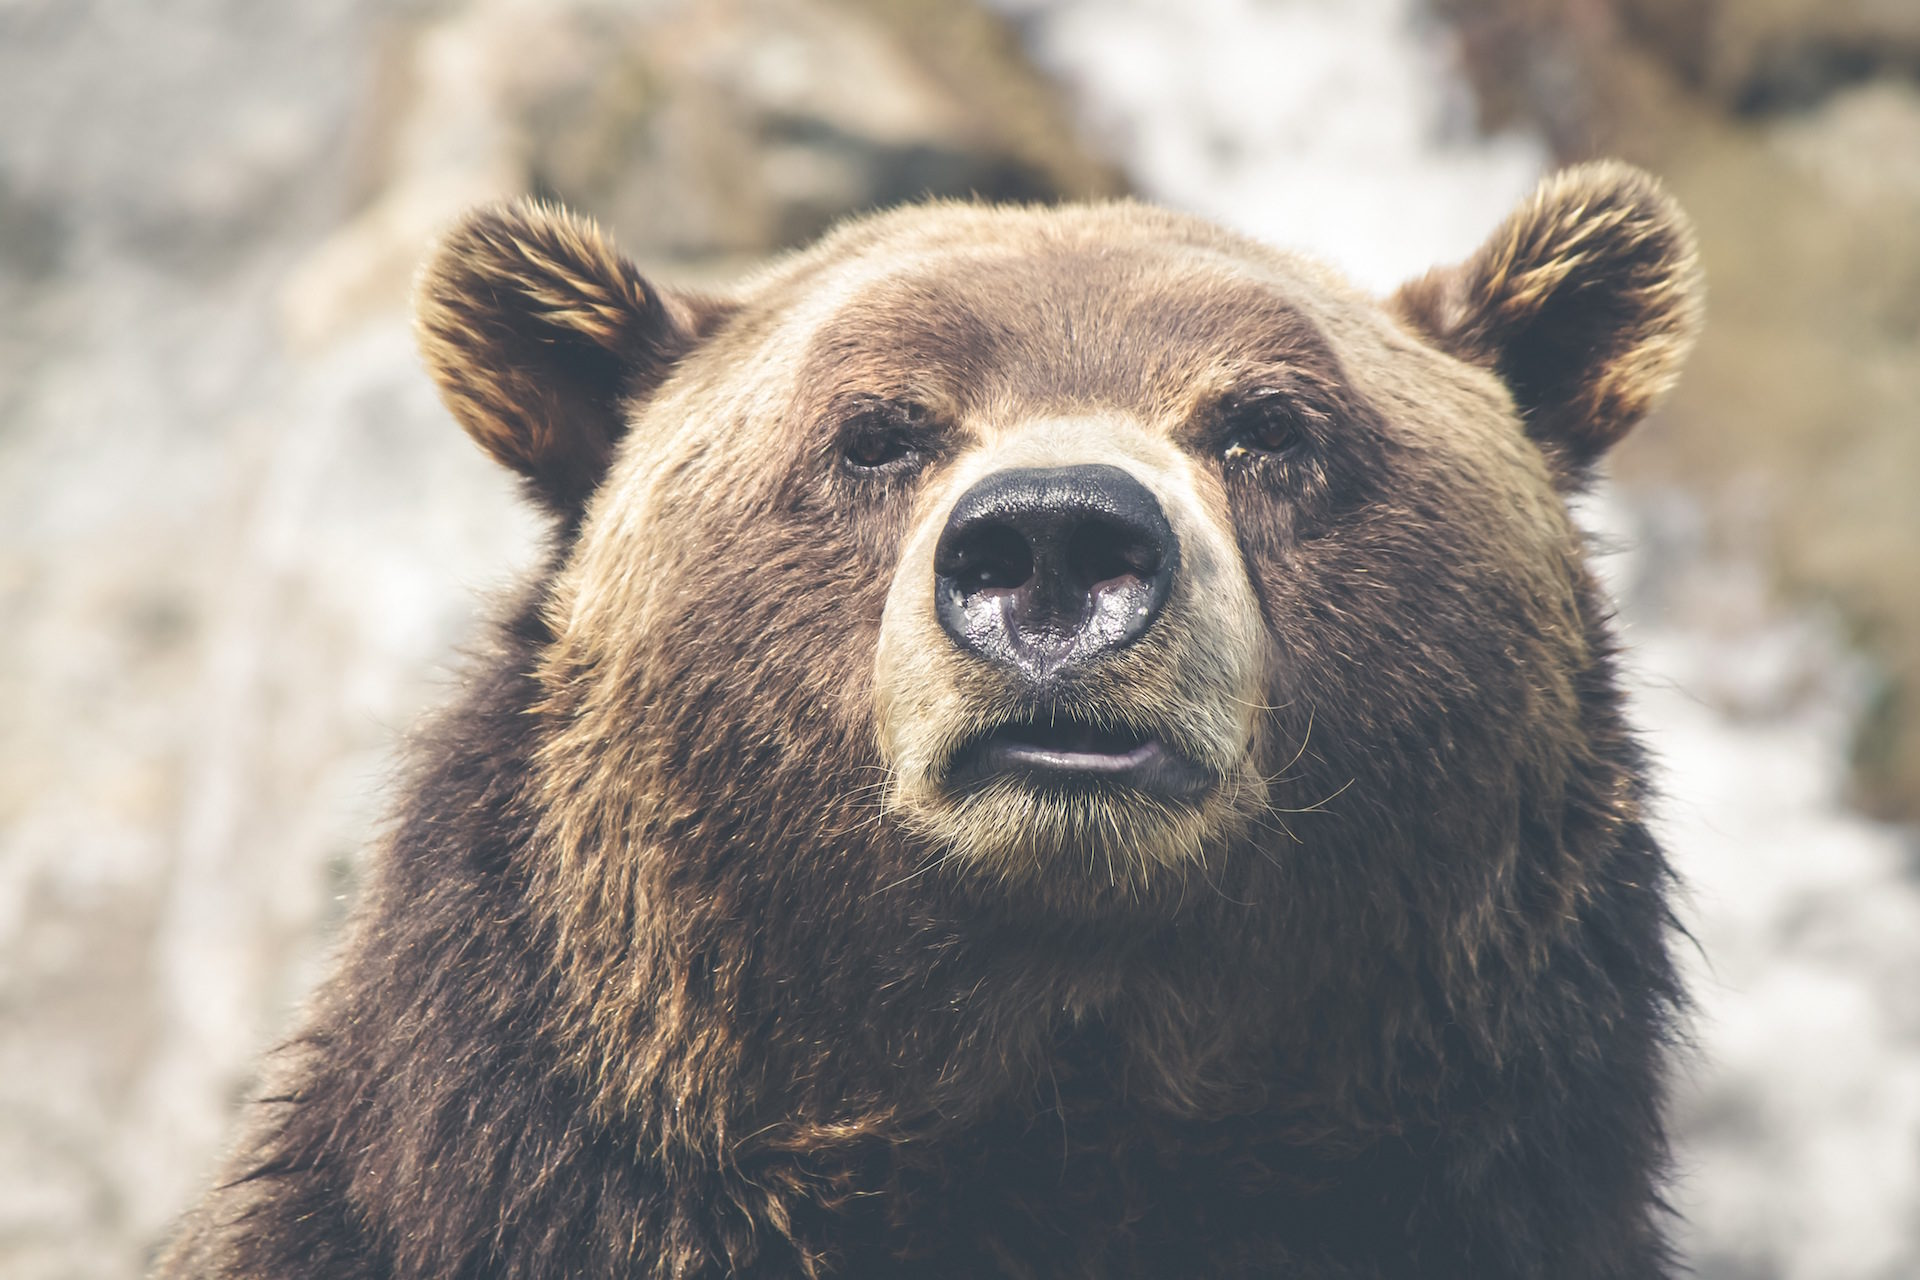 भालू, pardo, देखो, थूथन, जंगली - HD वॉलपेपर - प्रोफेसर-falken.com